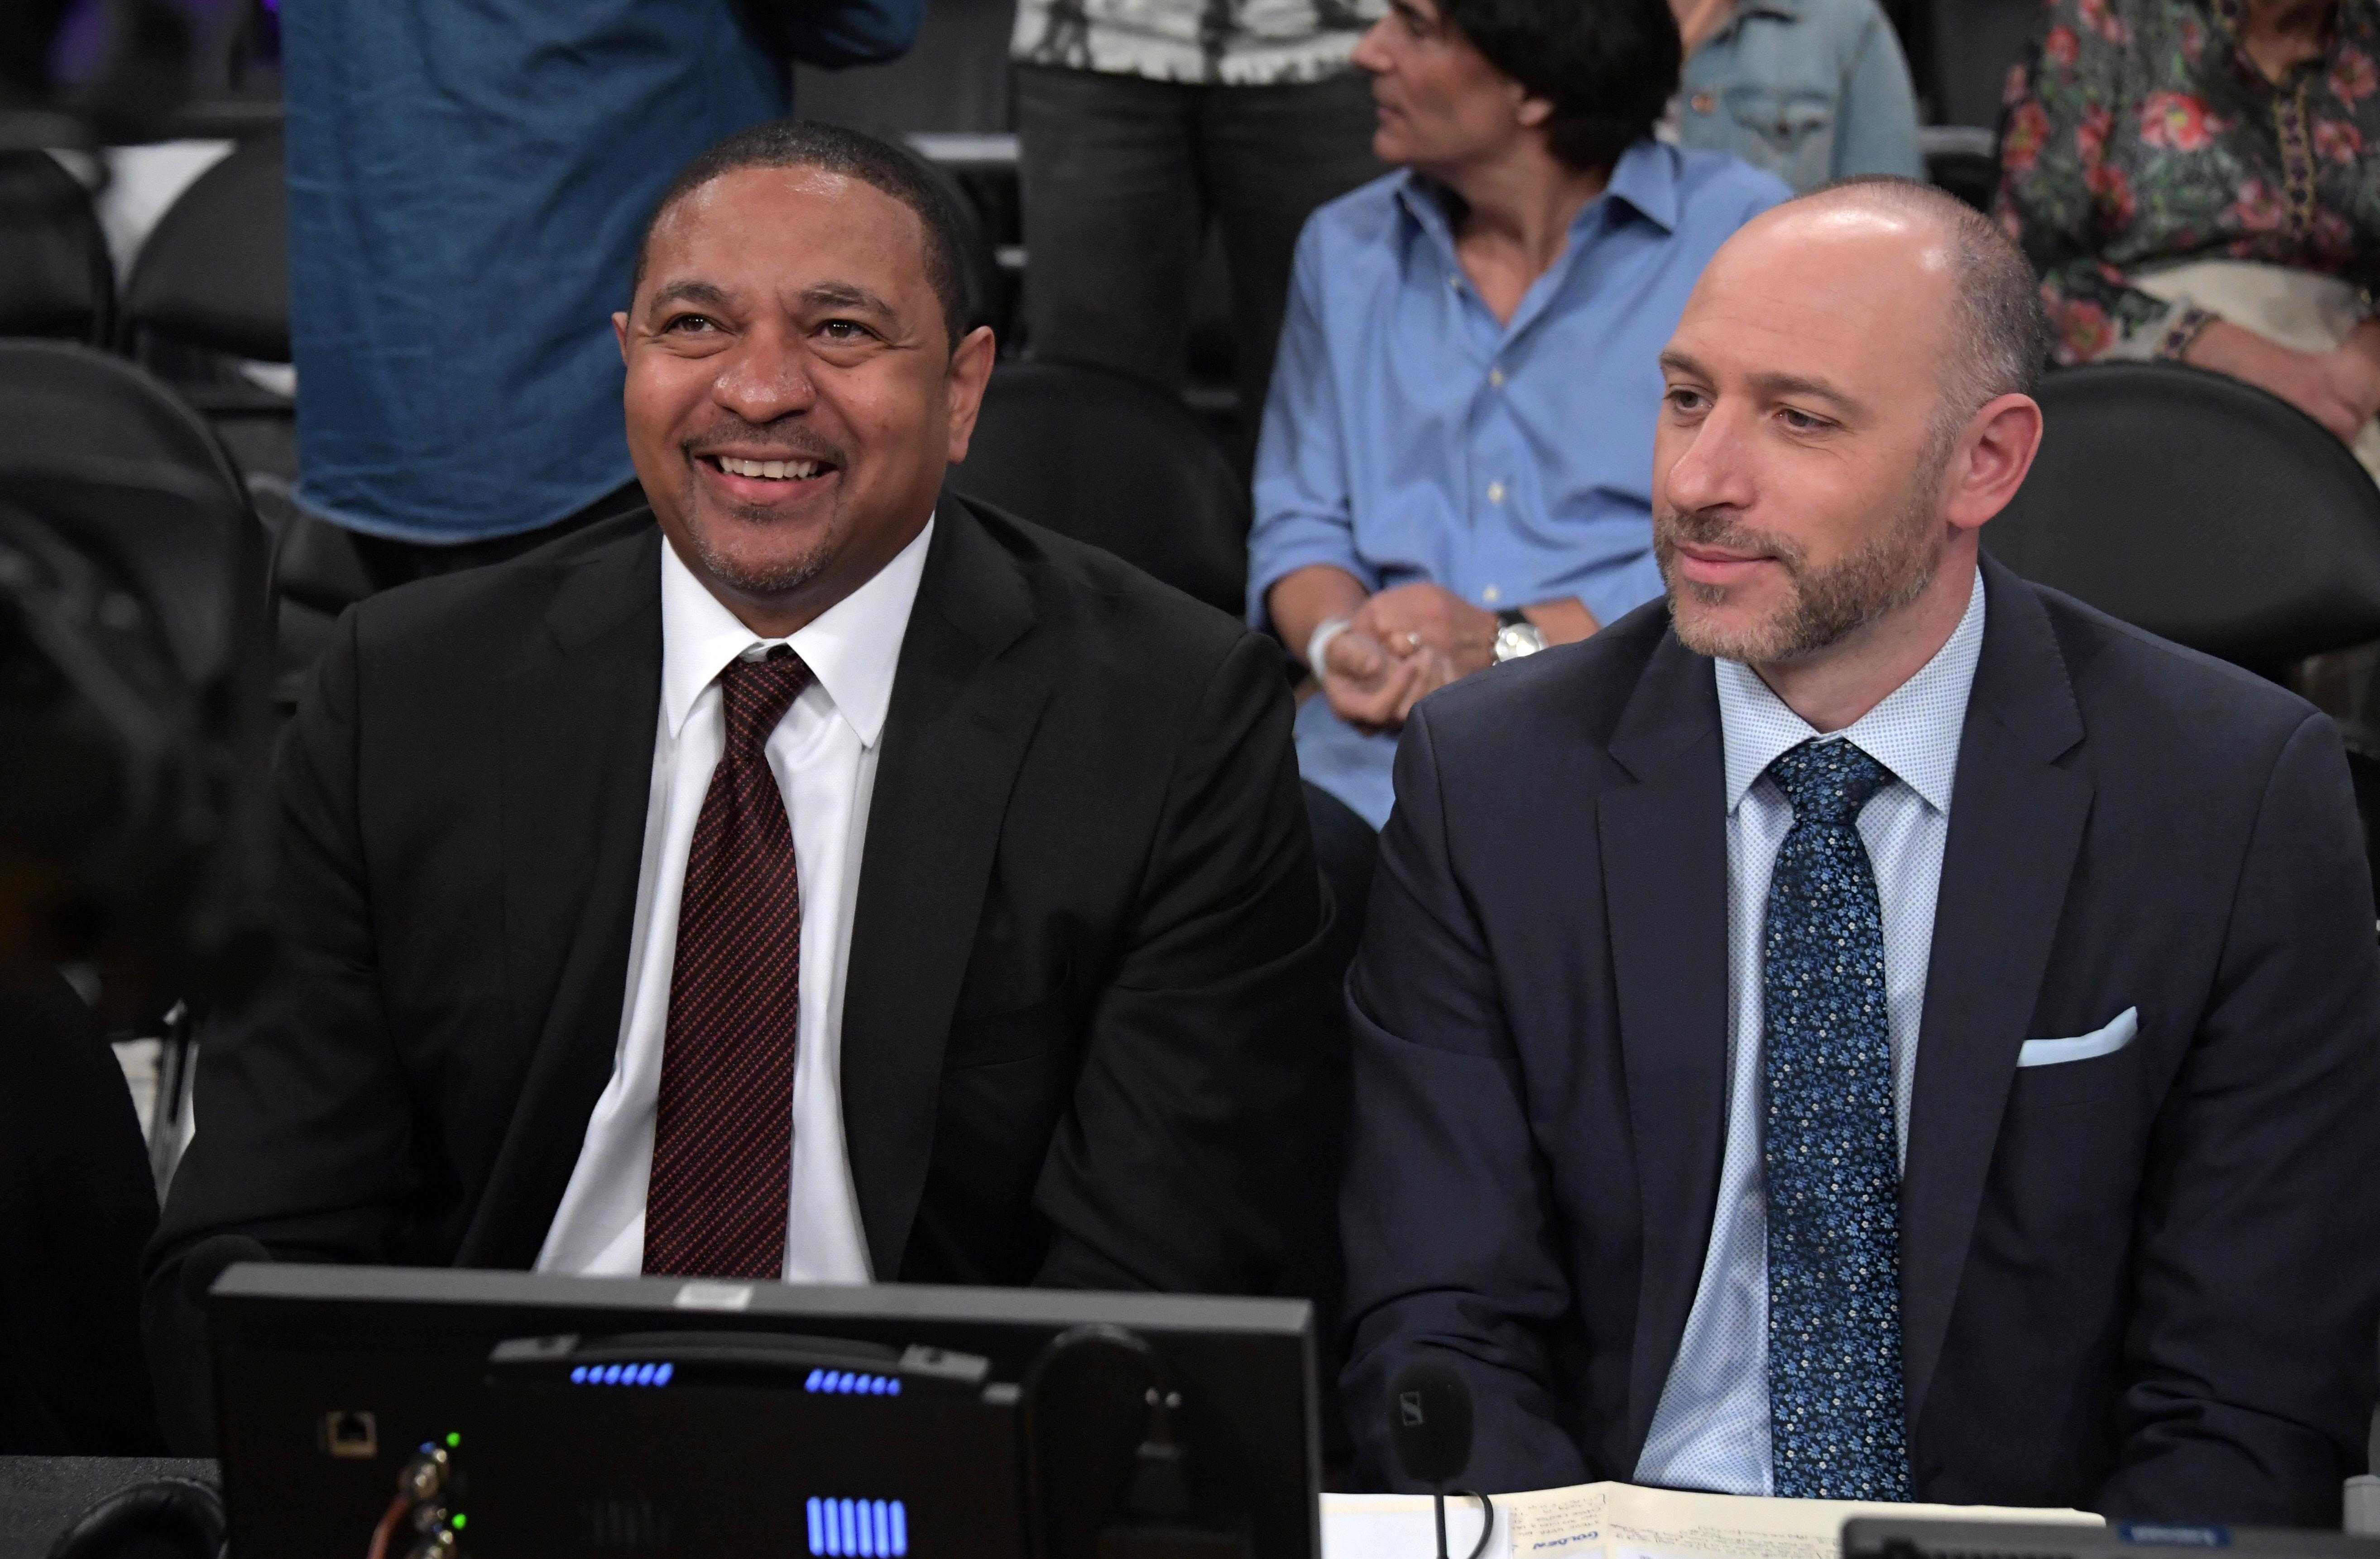 Jeff Van Gundy, Mark Jackson in mix for Knicks head coaching job